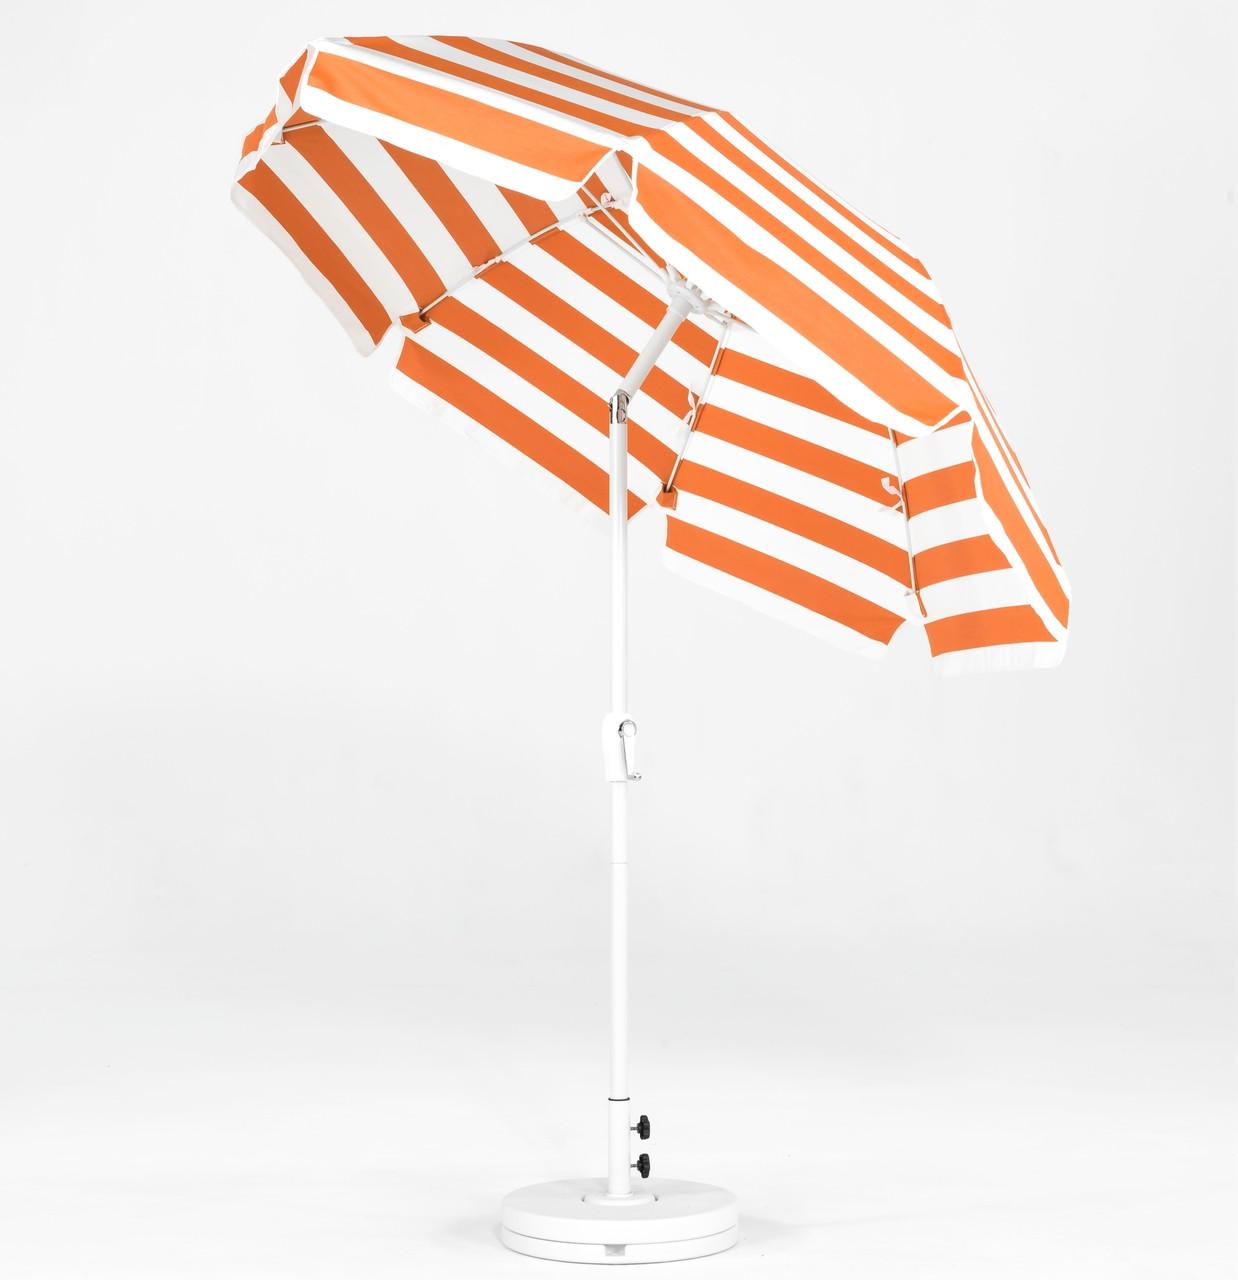 Commercial Grade Fiberglass Patio Umbrella With Crank